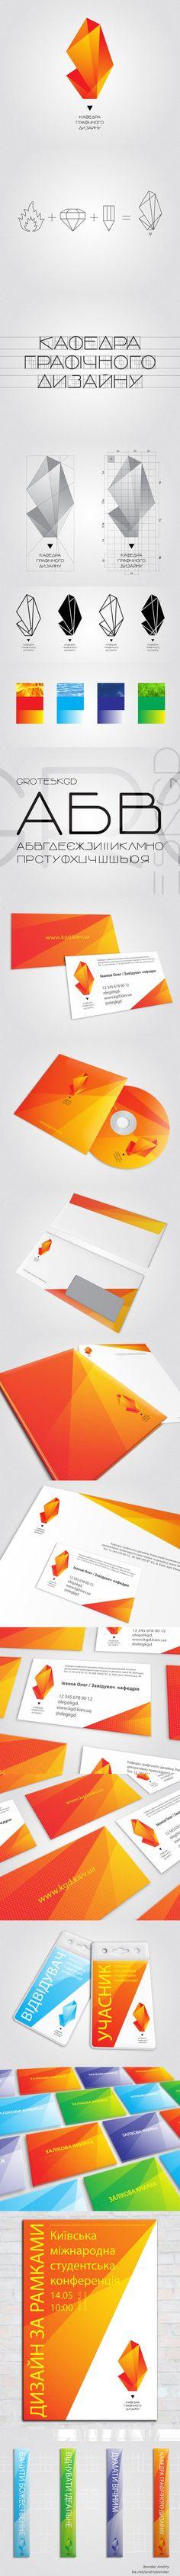 Department of Graphic Design. Branding.